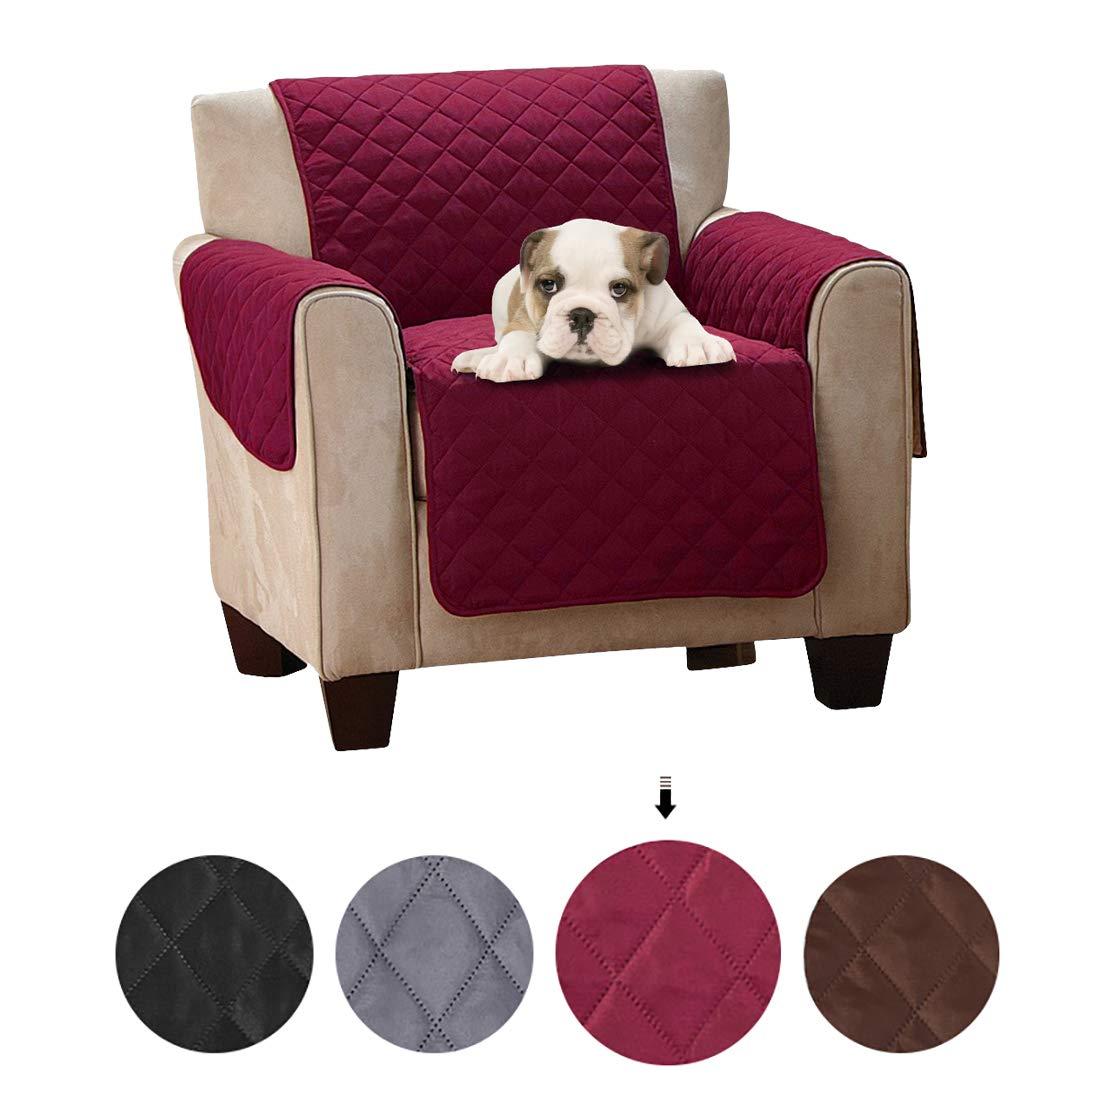 SearchI Fundas de Sofá 1 Plazas Impermeable Cubierta para Sofa Reversible Cubre de Sofa Antideslizante Protector para Sofás Muebles Acolchado contra ...